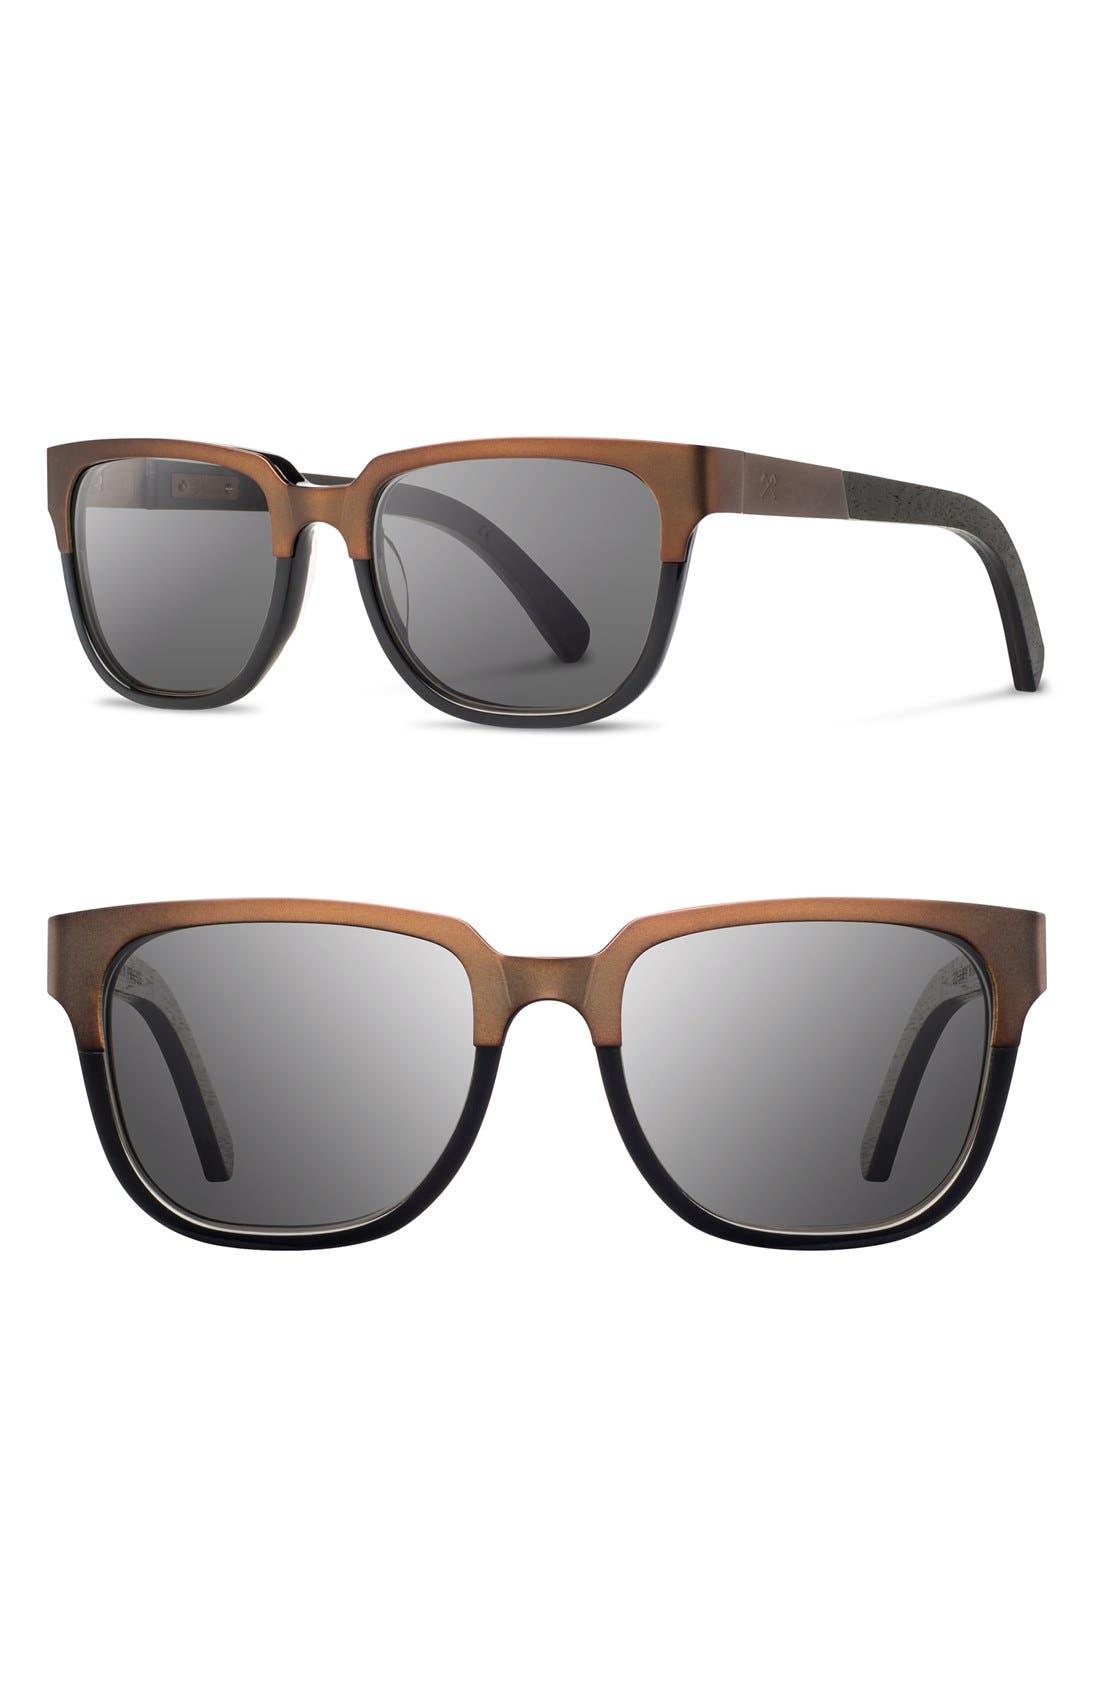 Alternate Image 1 Selected - Shwood 'Prescott' 52mm Titanium & Wood Sunglasses